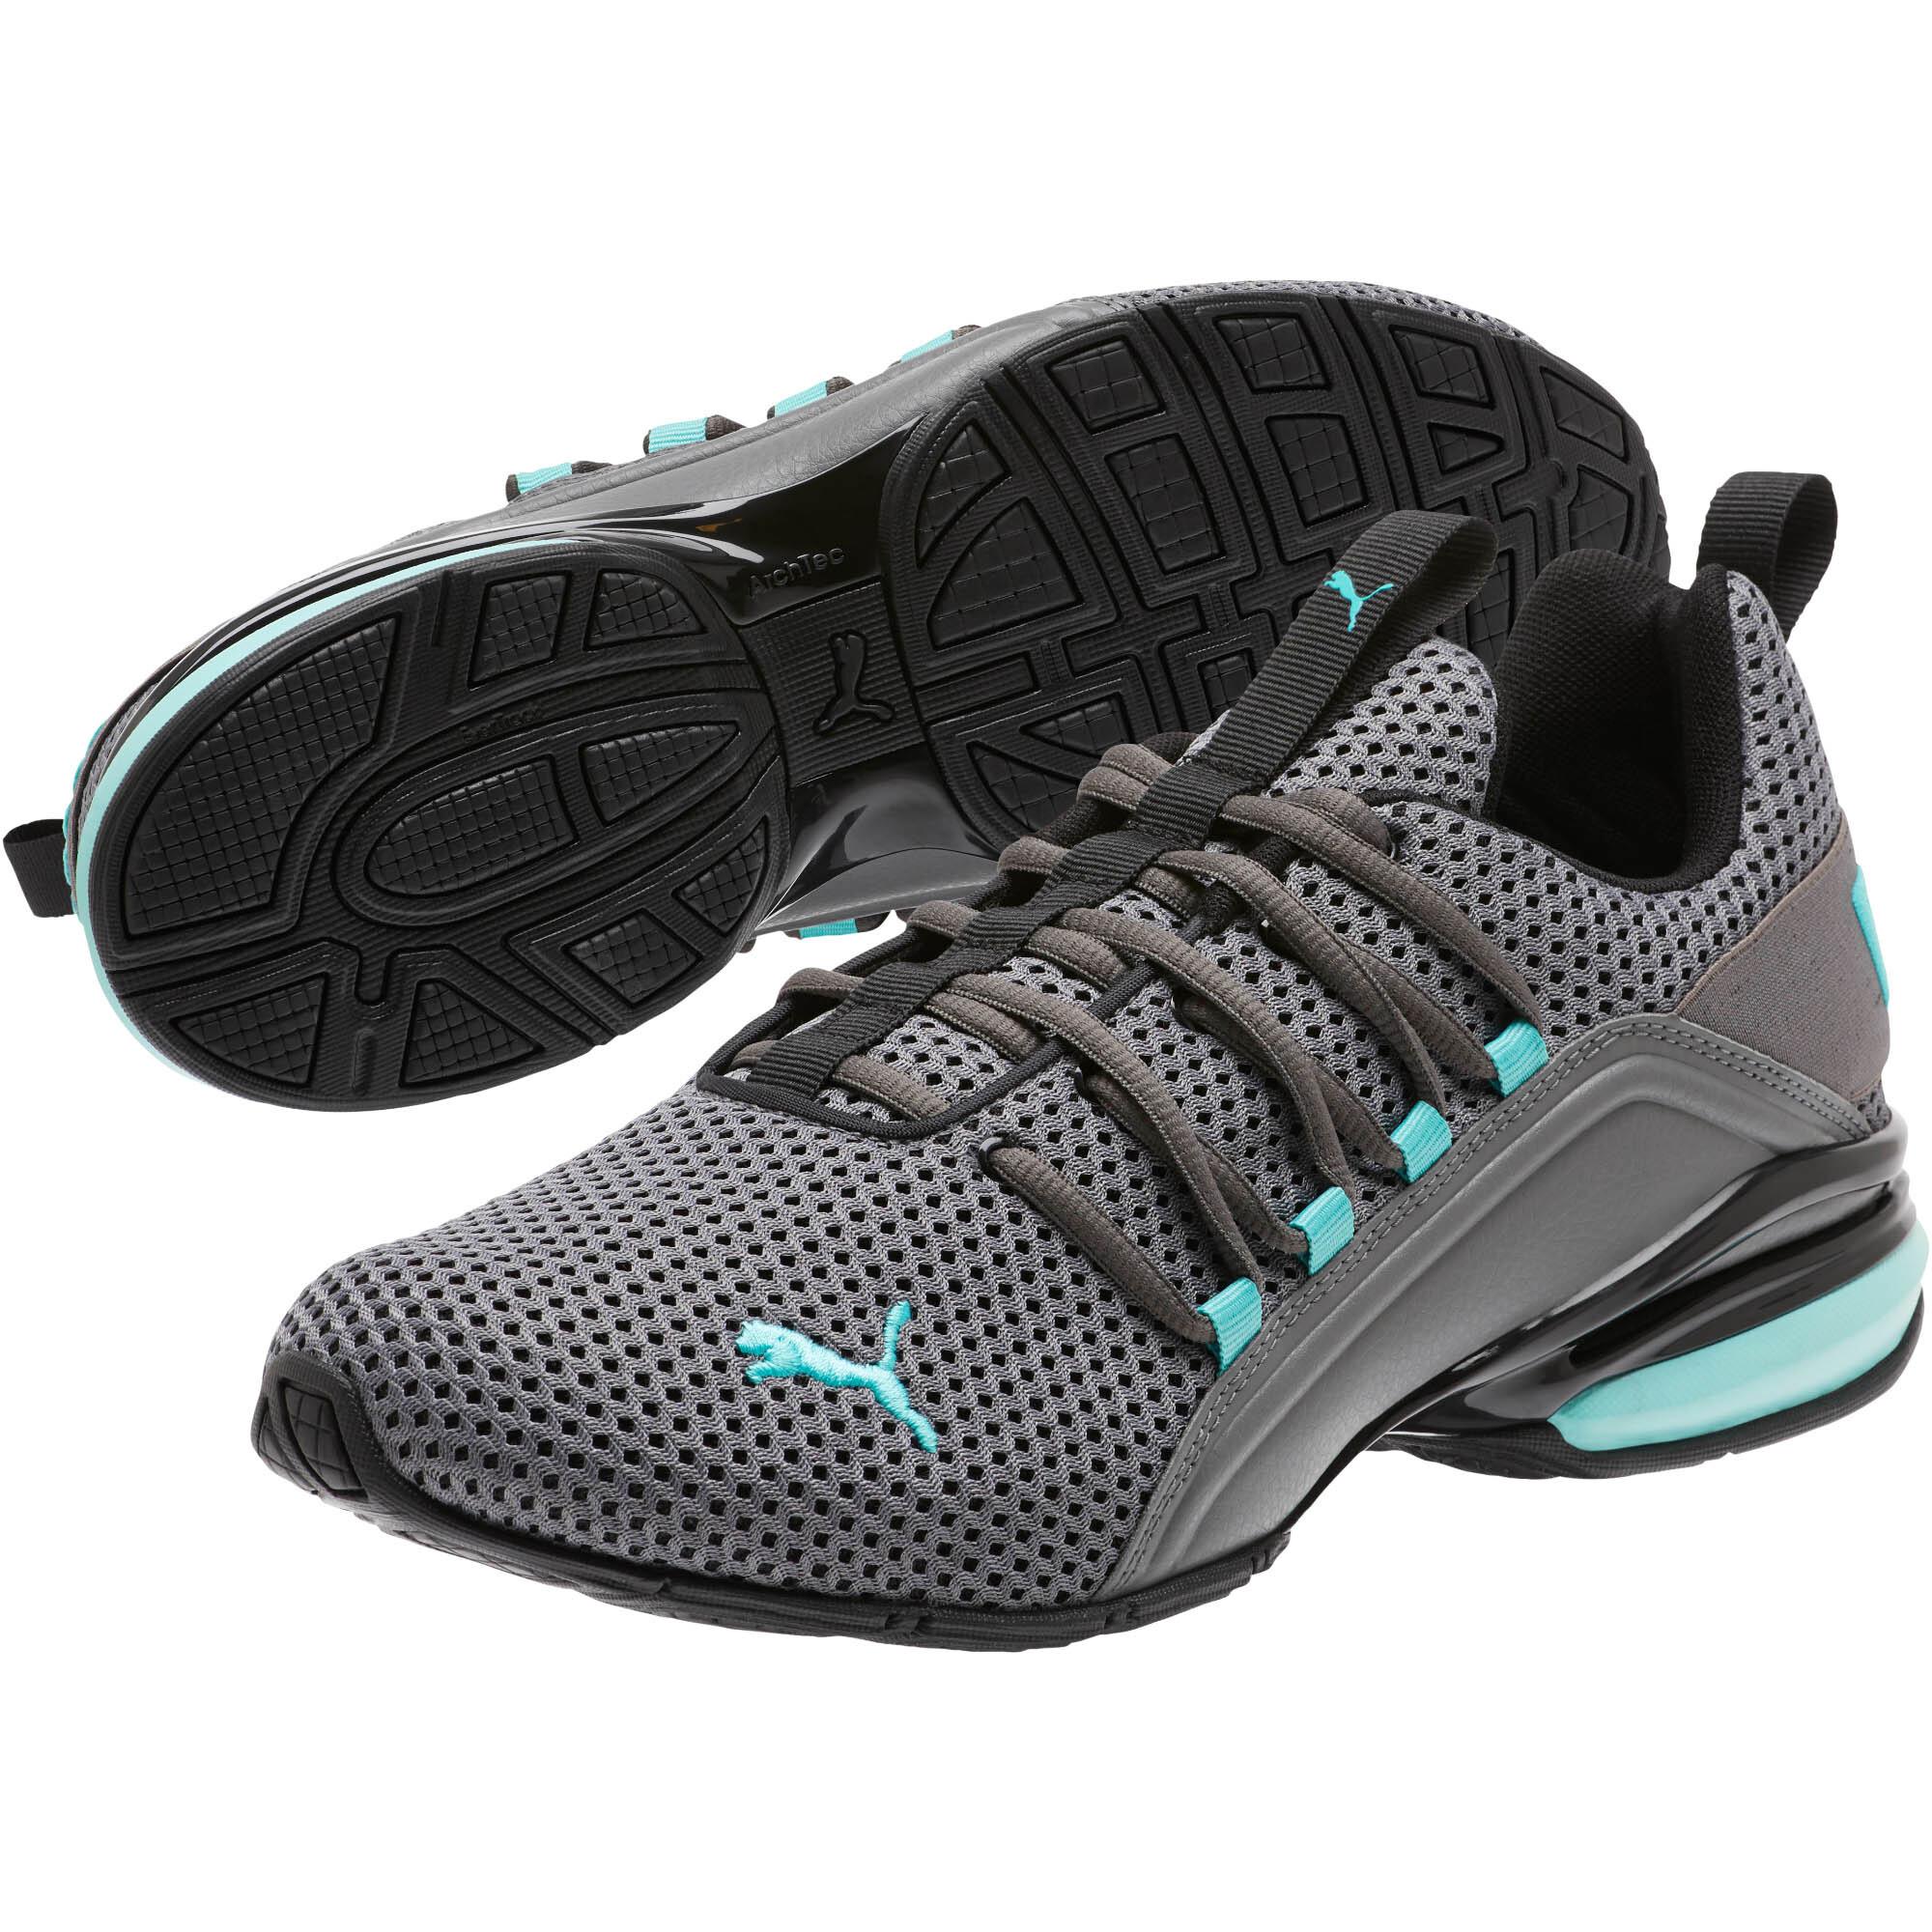 PUMA-Axelion-Breathe-Men-s-Training-Shoes-Men-Shoe-Running